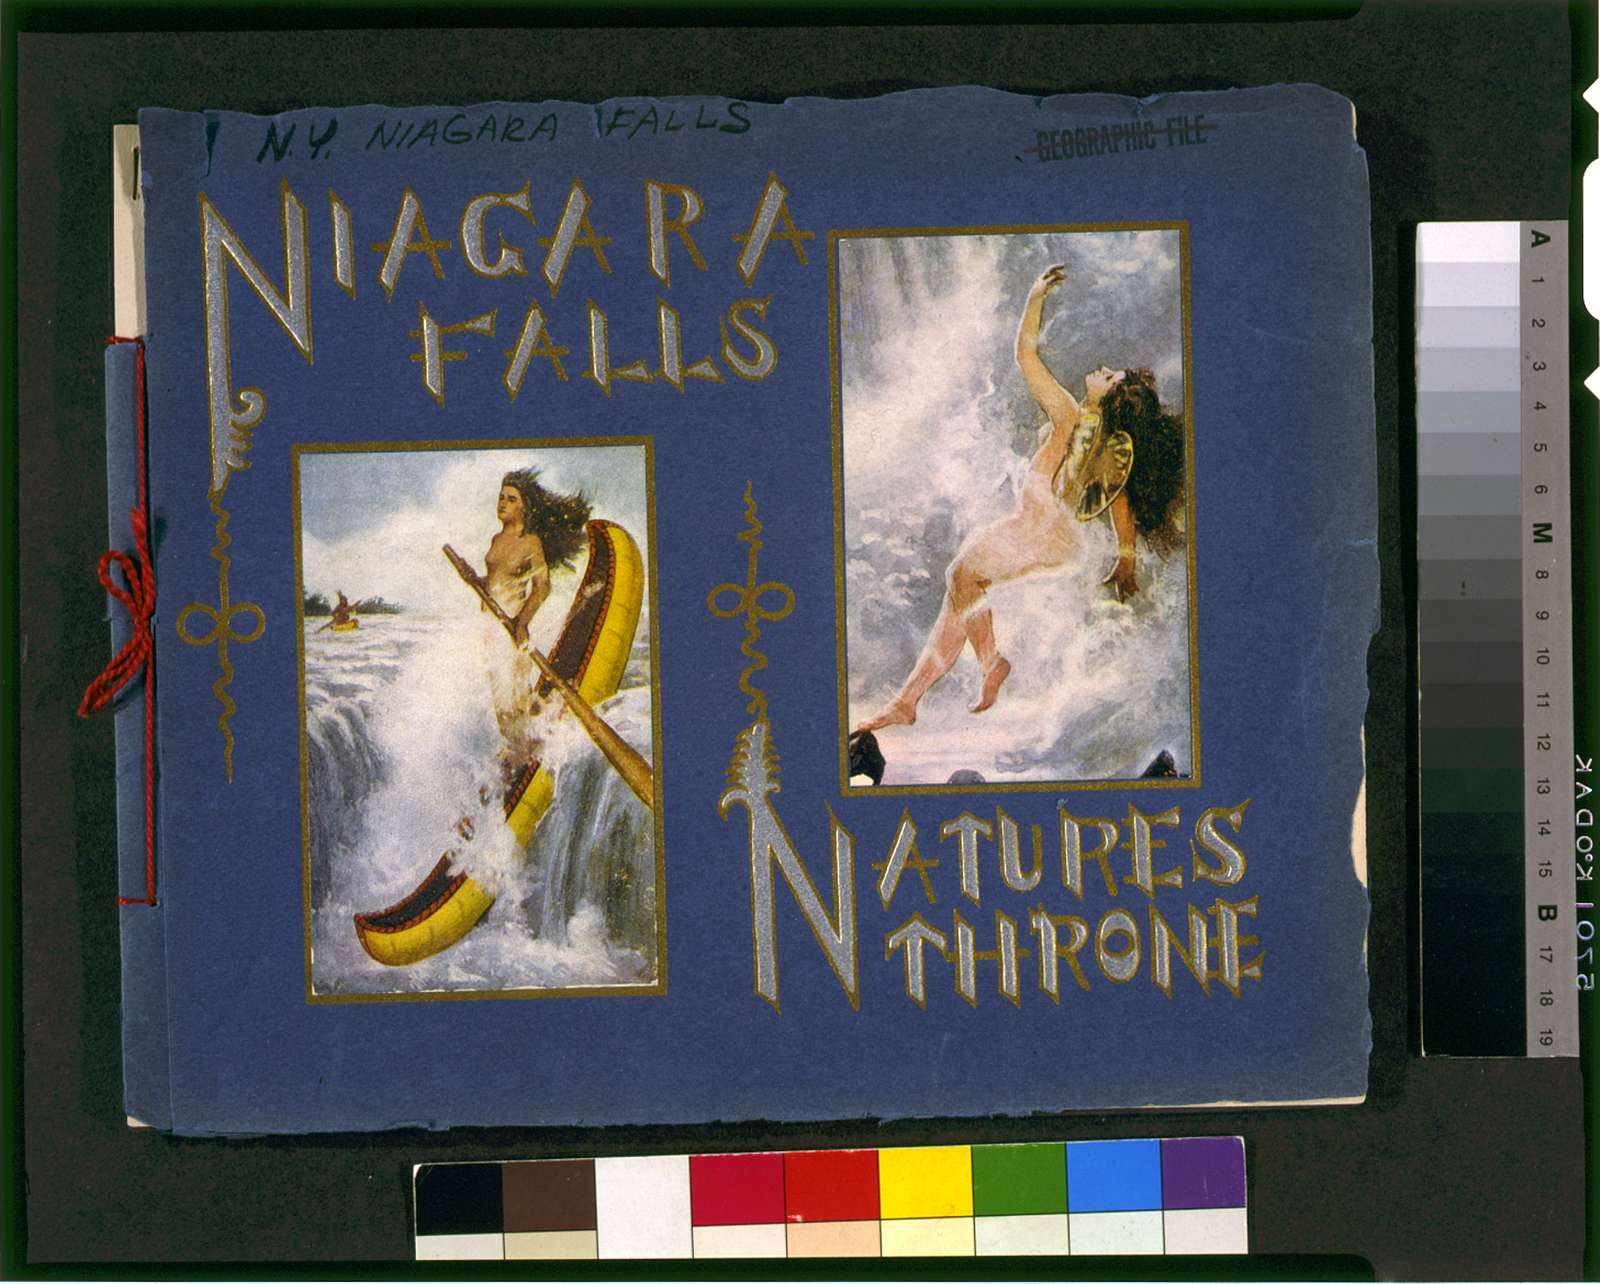 Niagara Falls nature's throne